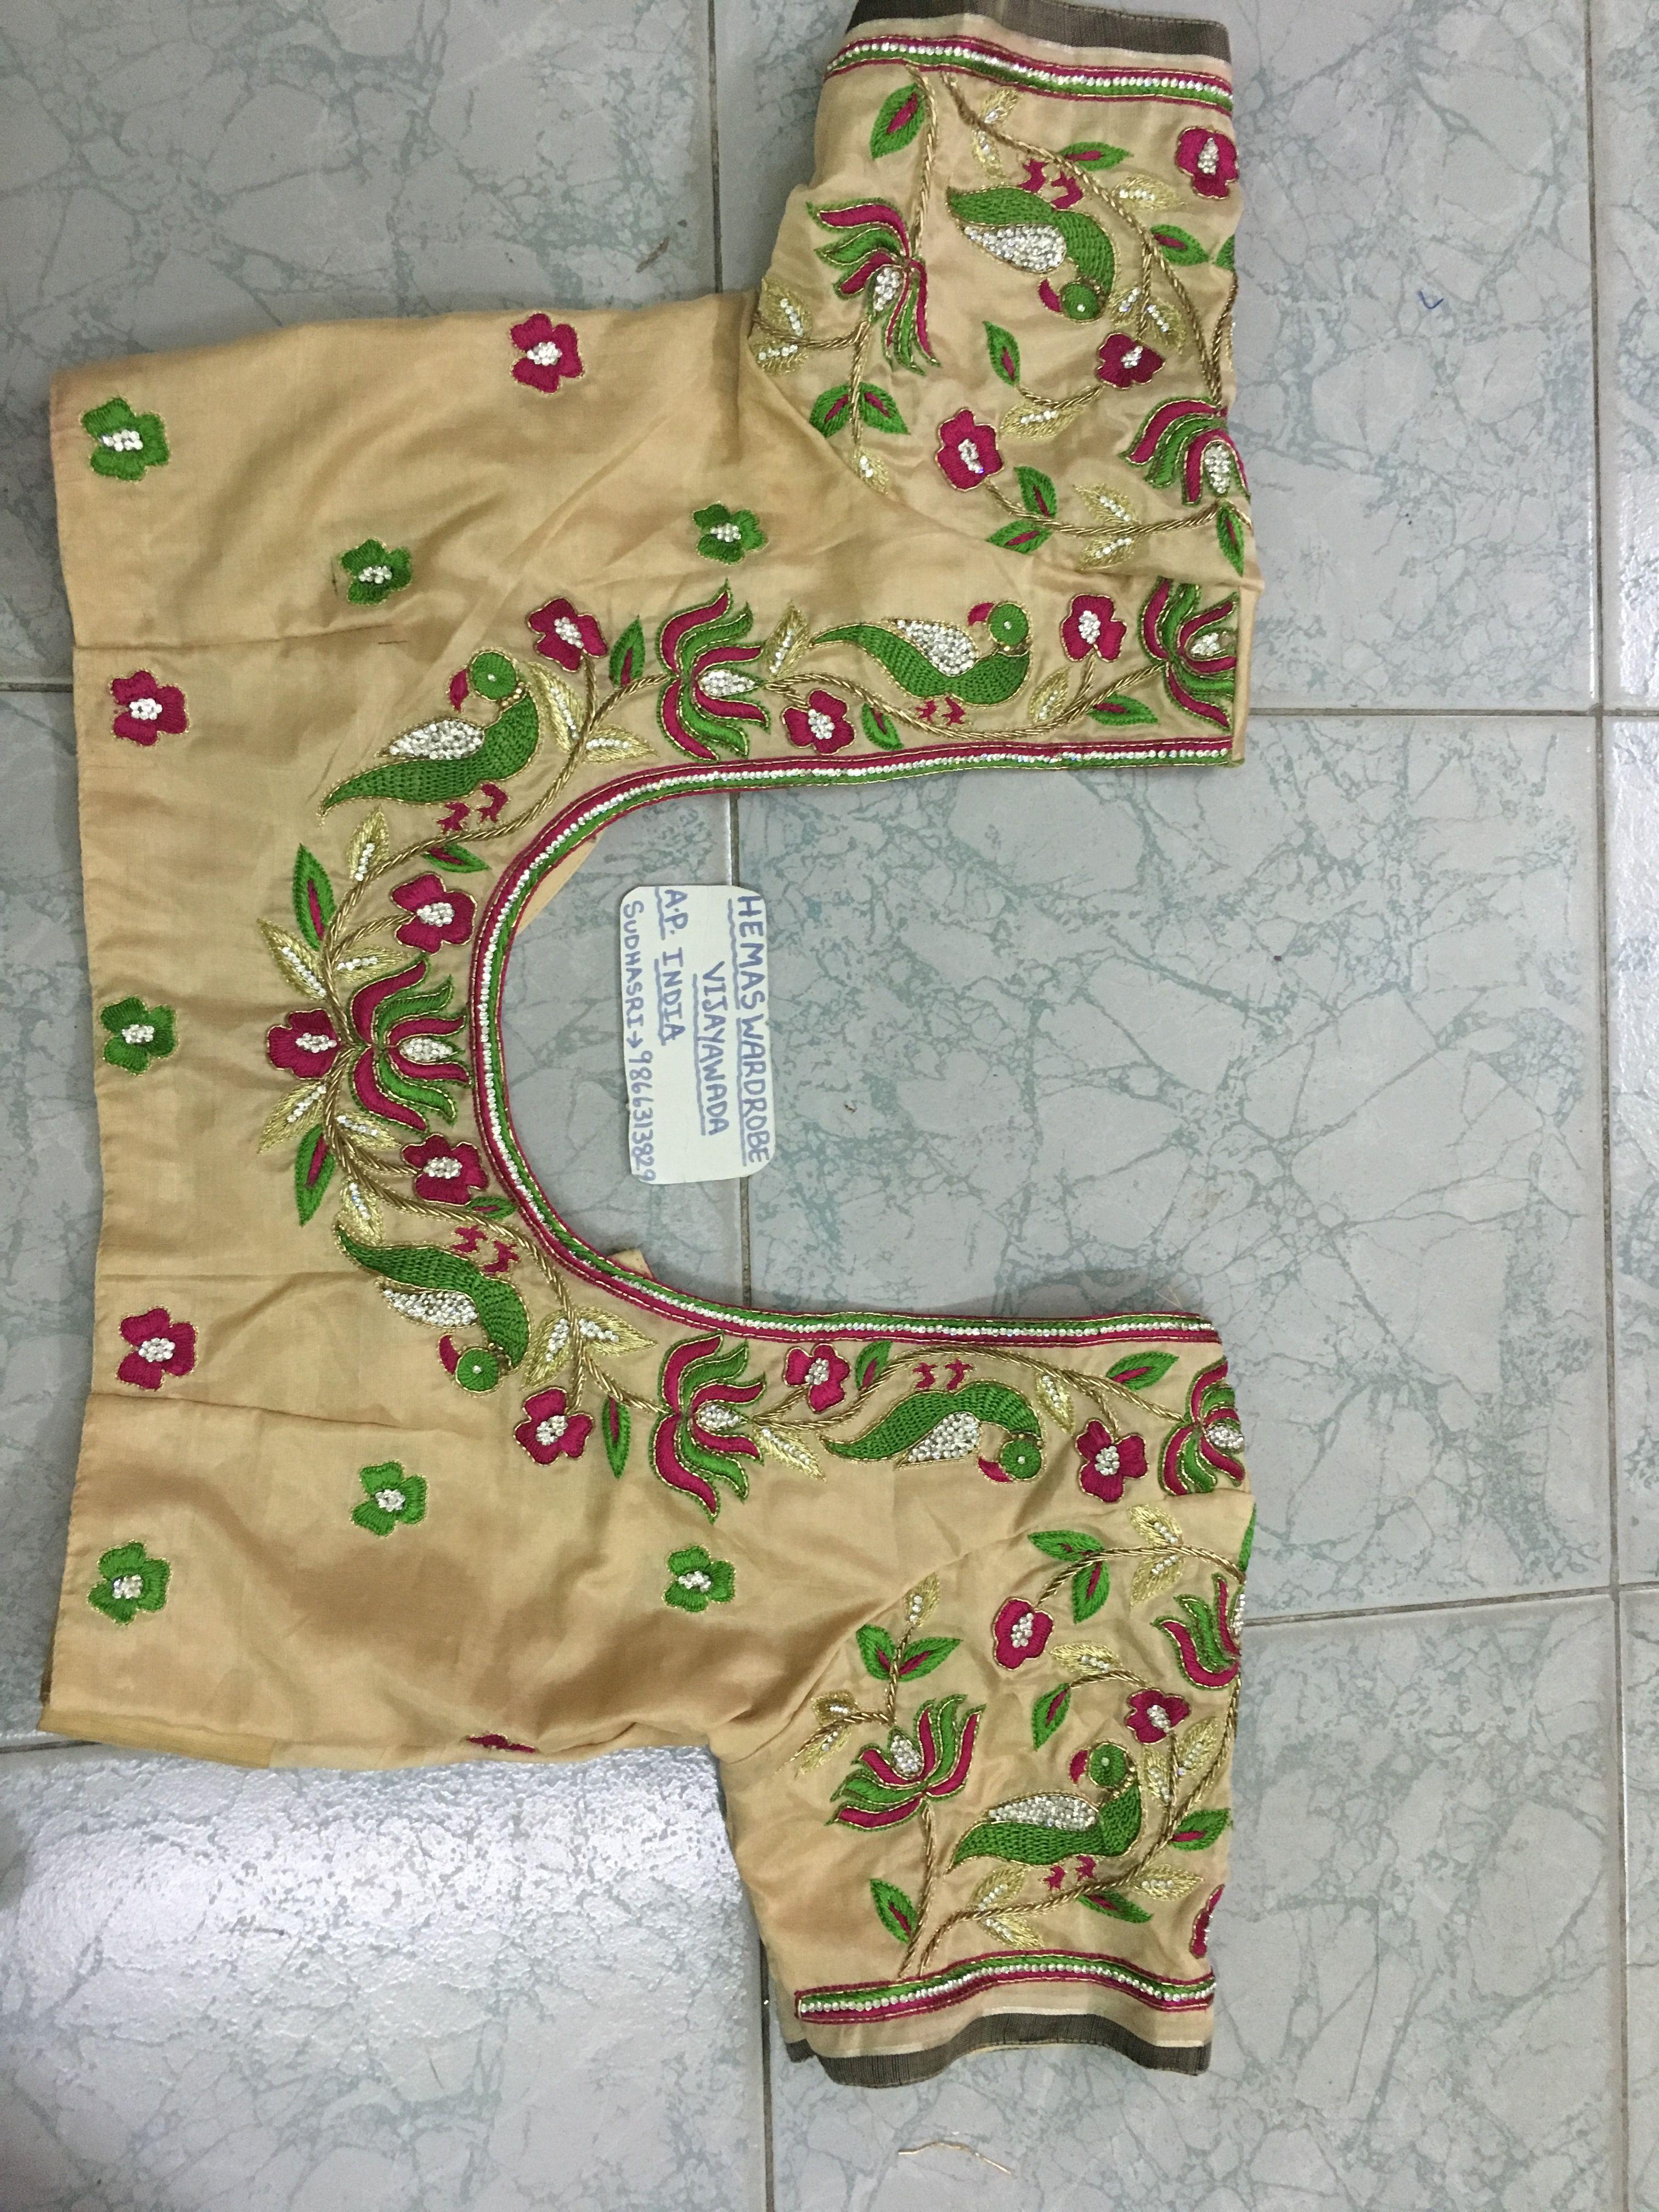 Sudhasri hemaswardrobe   Dress designs   Pinterest   Sumo